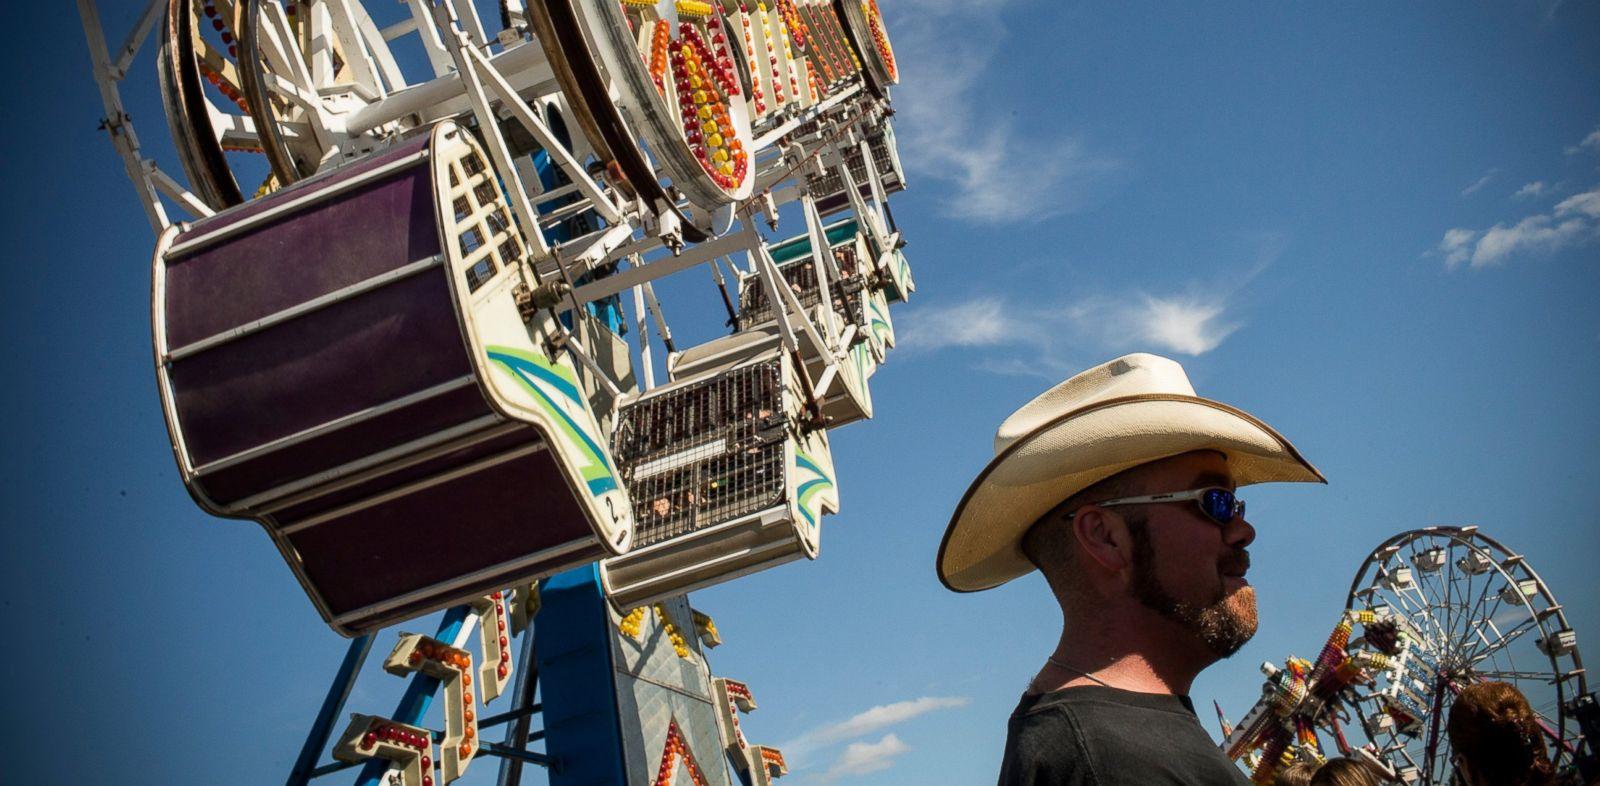 PHOTO: A man stands beneath a ride at the North Dakota state fair, July 27, 2013, in Williston, North Dakota.